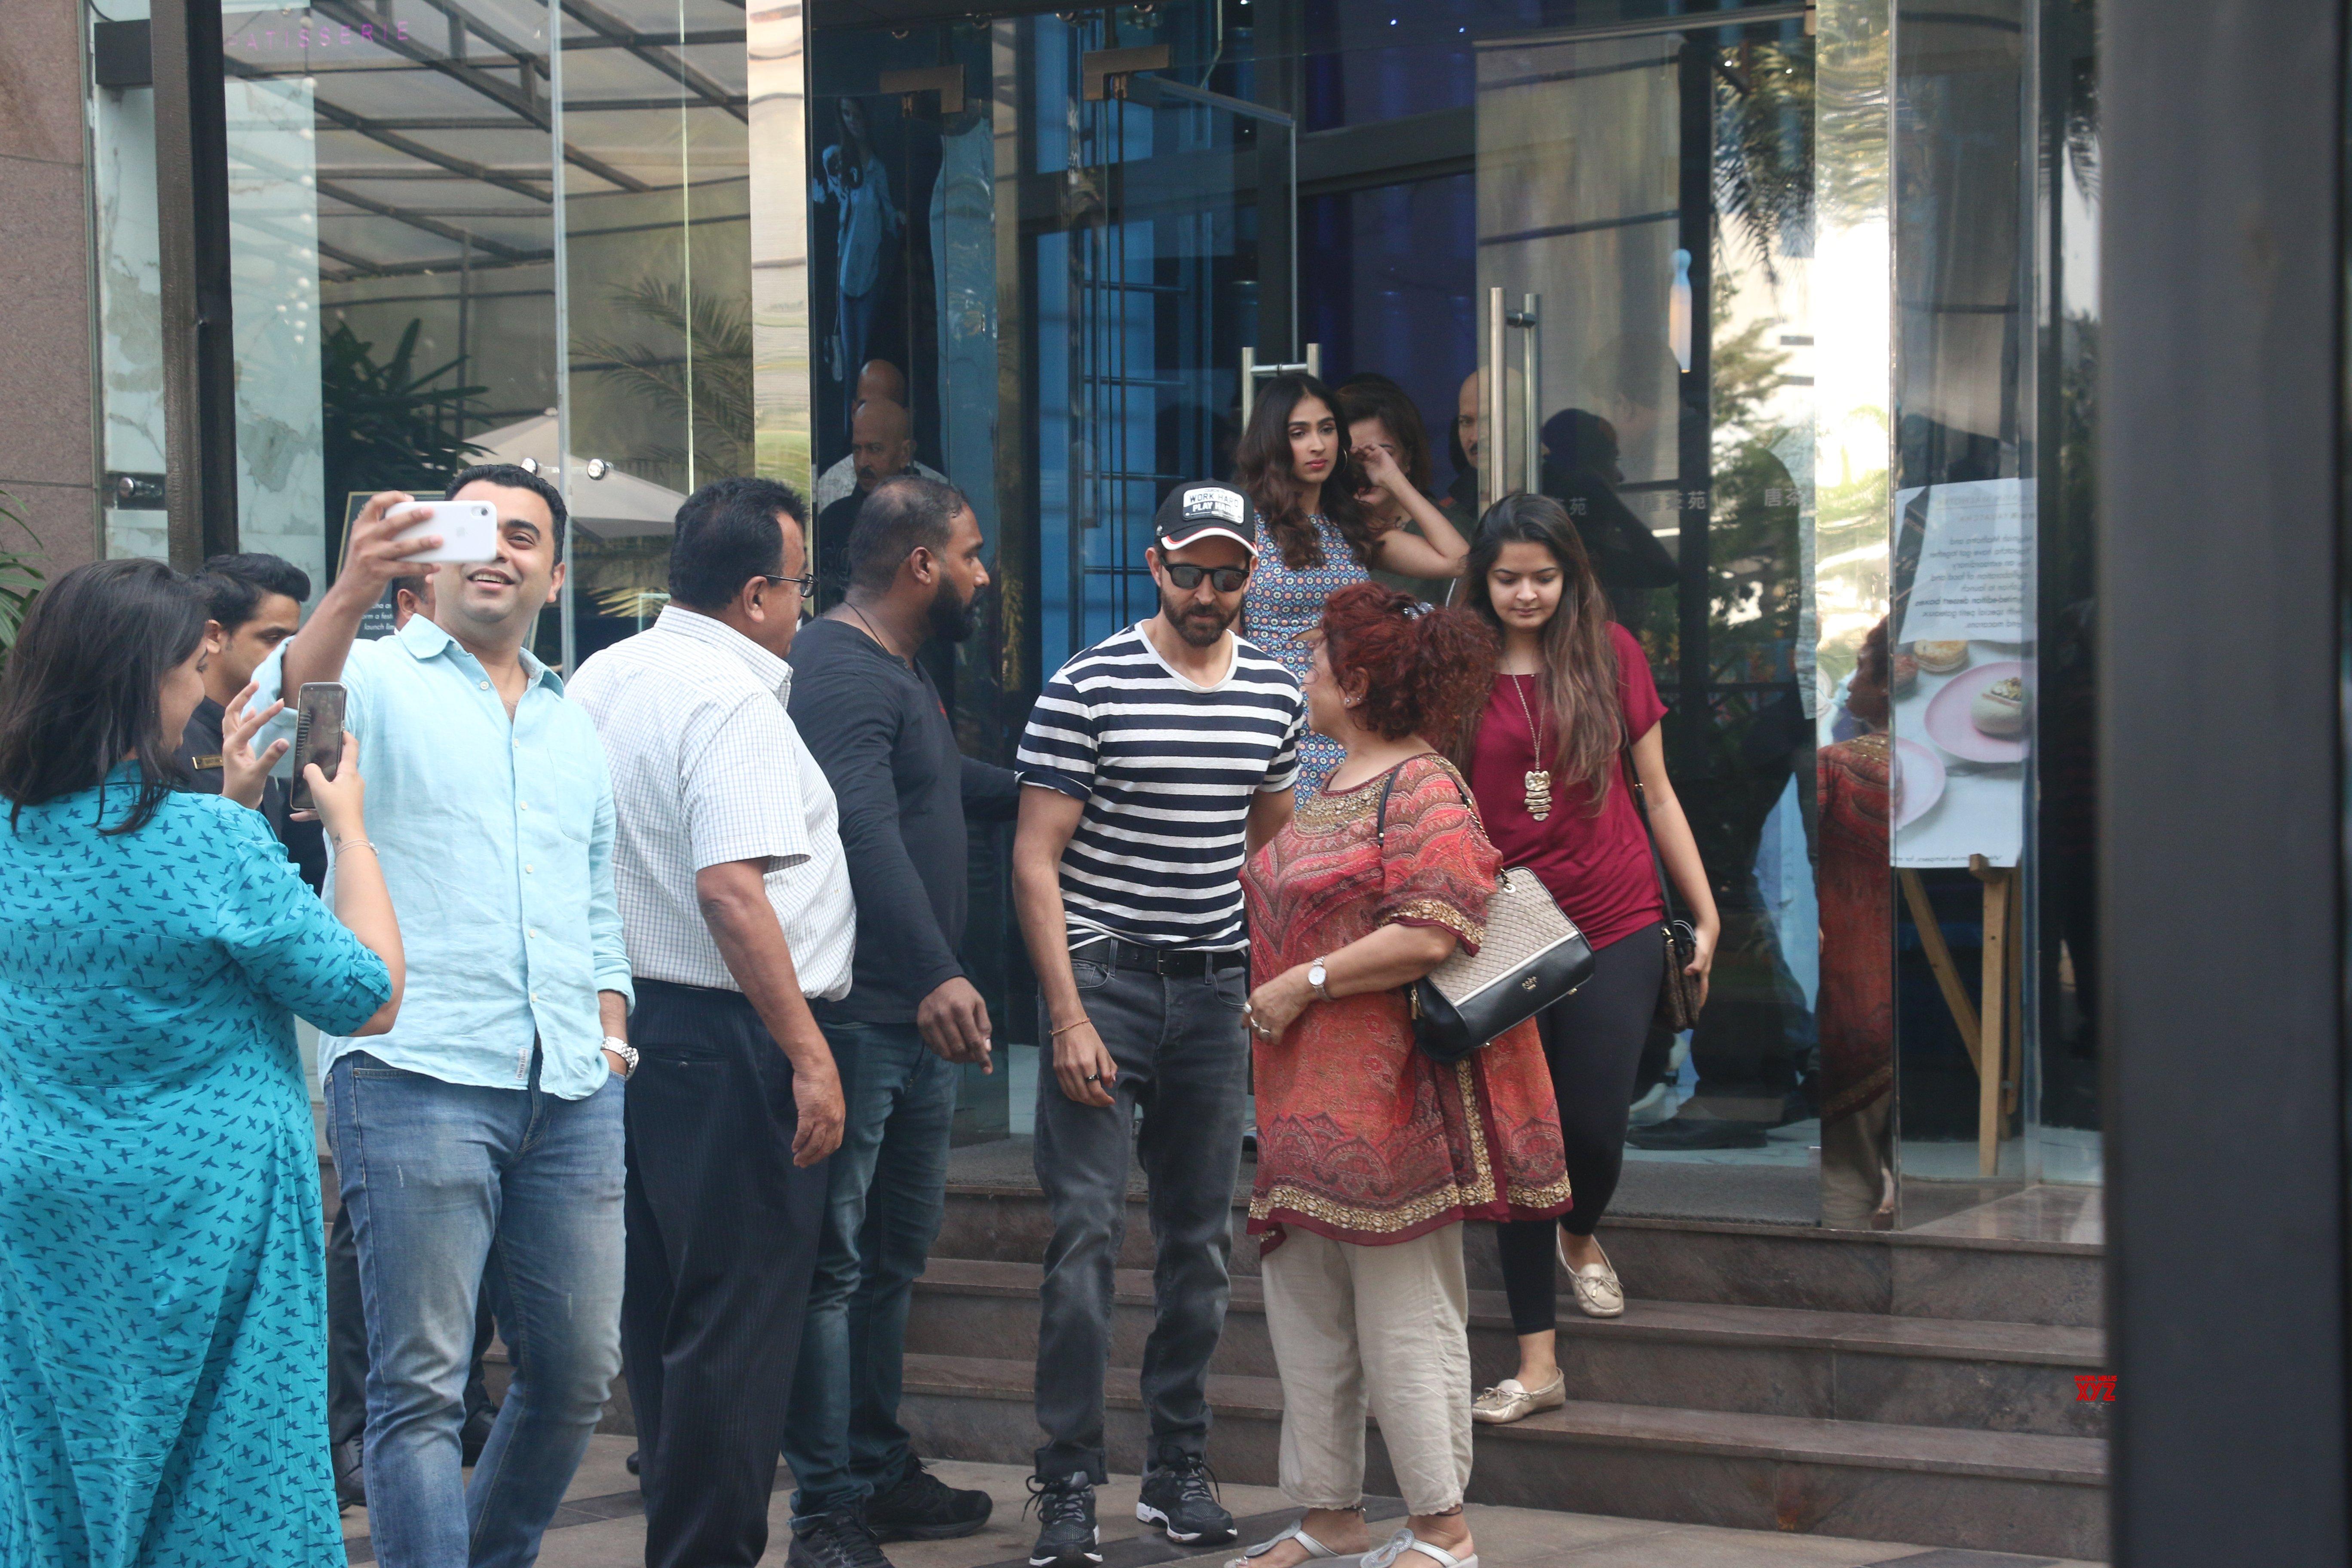 Hrithik Roshan And Family Celebrate His Cousin Pashmina Roshan's Birthday At BKC - Gallery